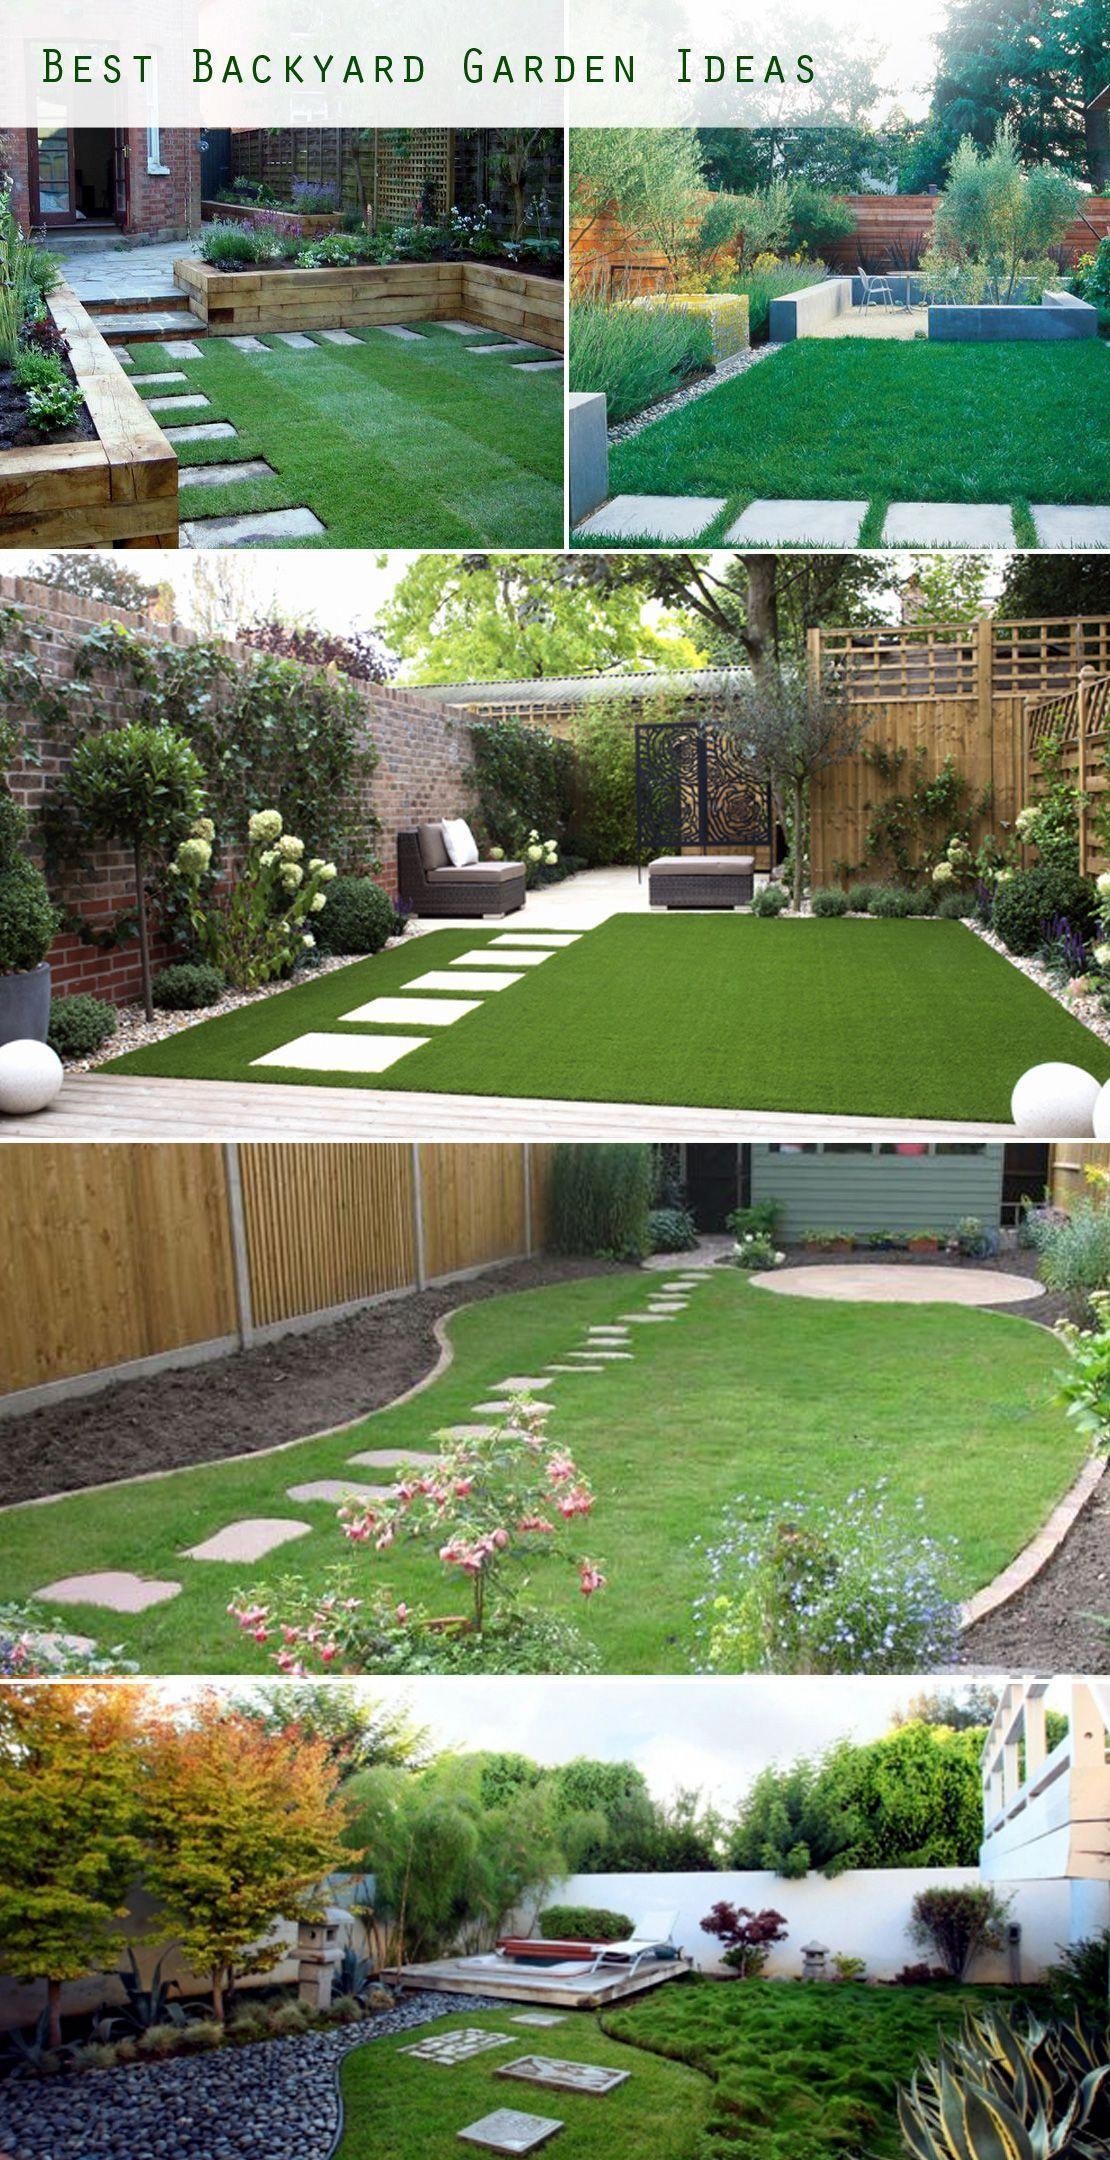 Fantastic Backyard Design and Ideas on a Budget | anifa ... on Backyard Desert Landscaping Ideas On A Budget id=62820